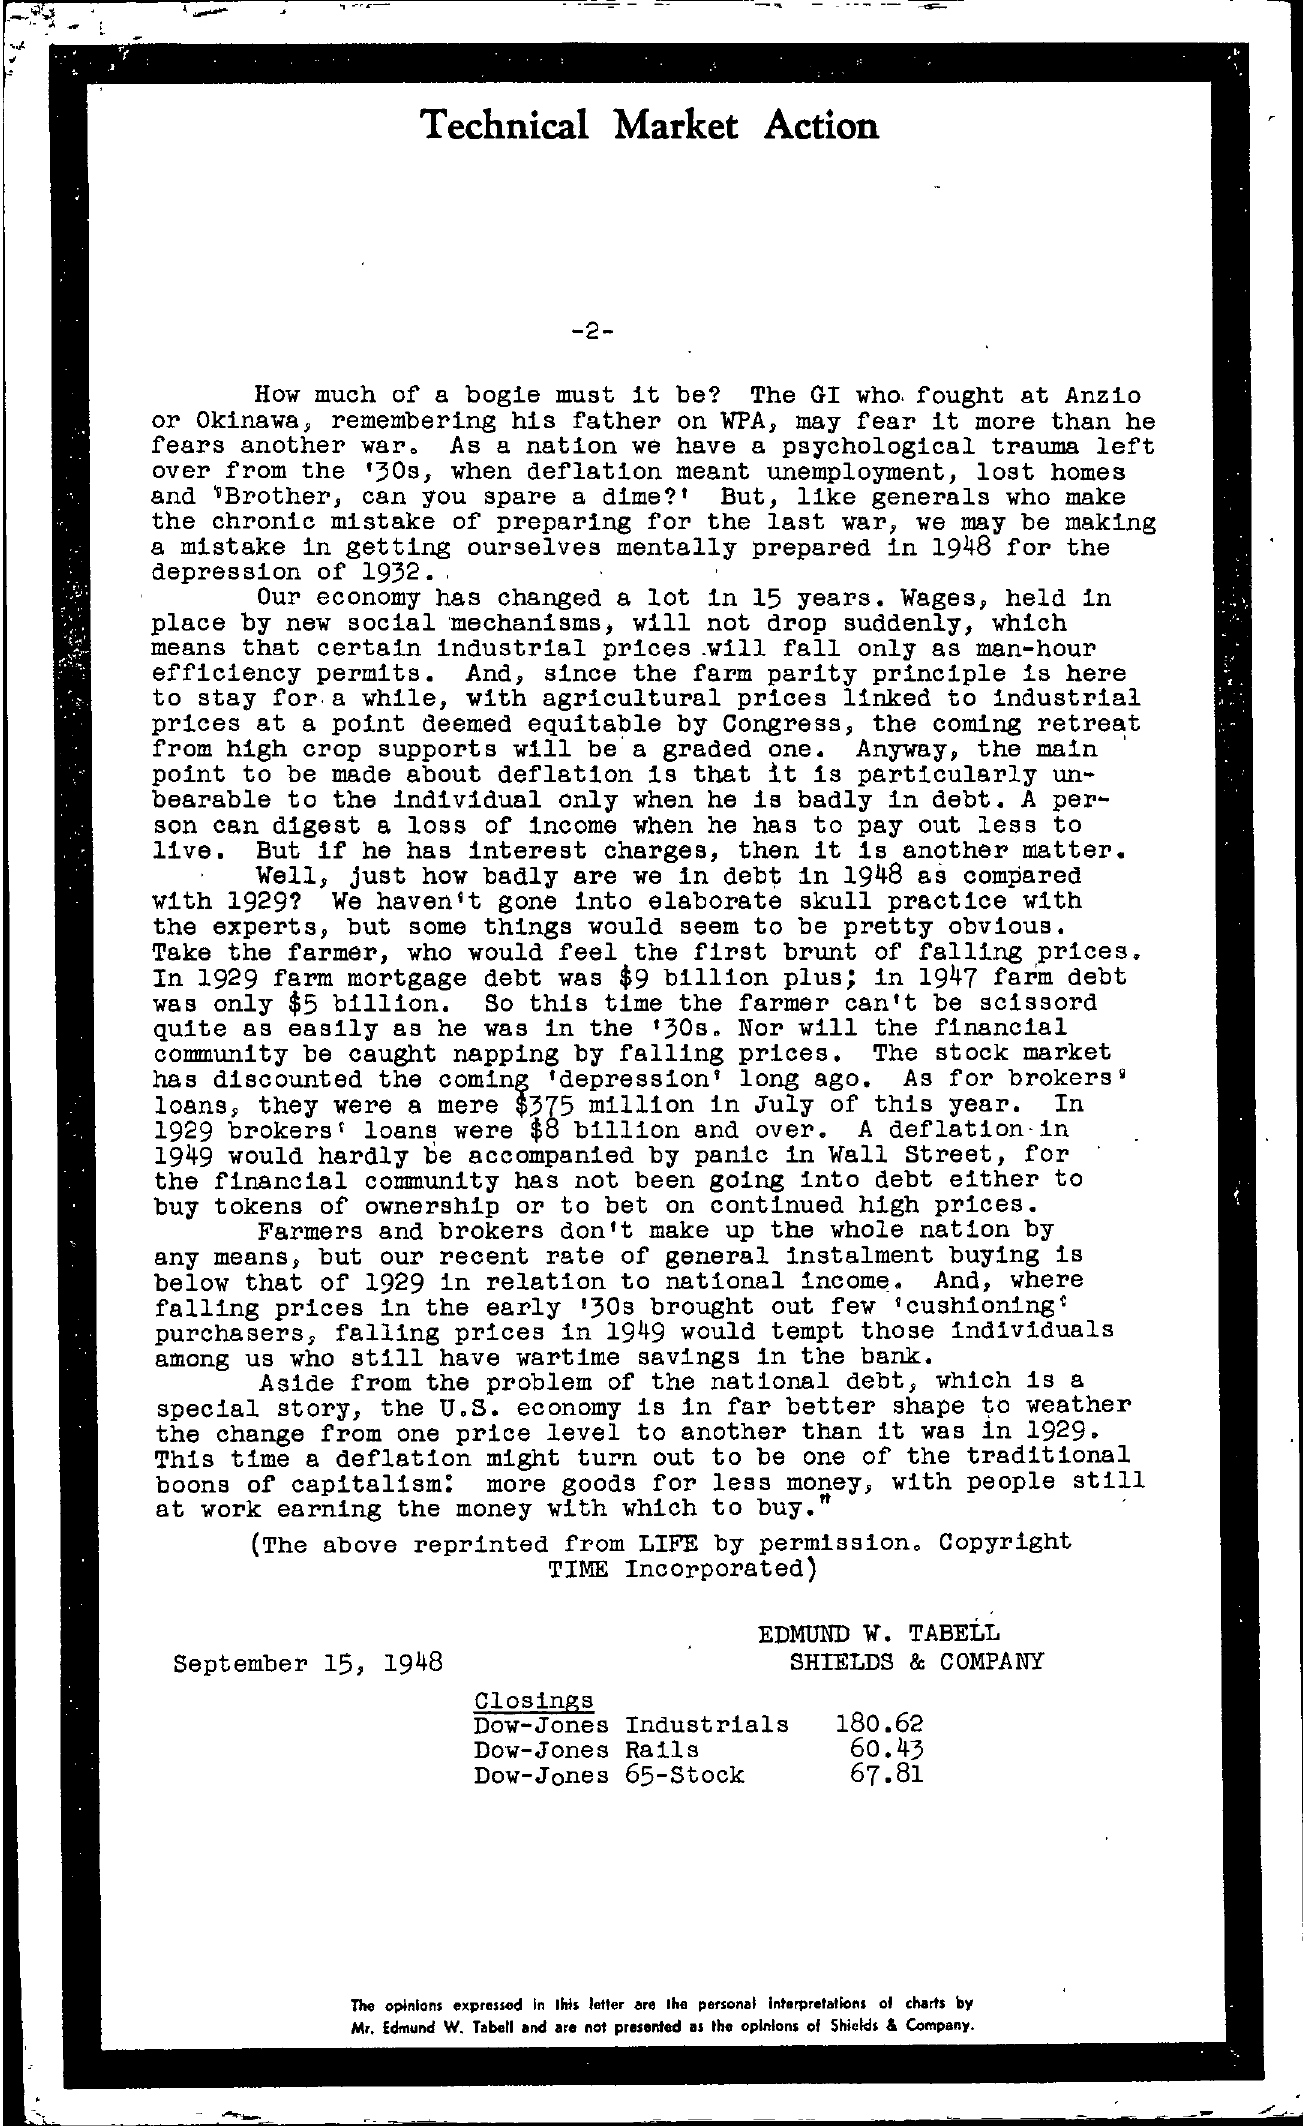 Tabell's Market Letter - September 15, 1948 page 2